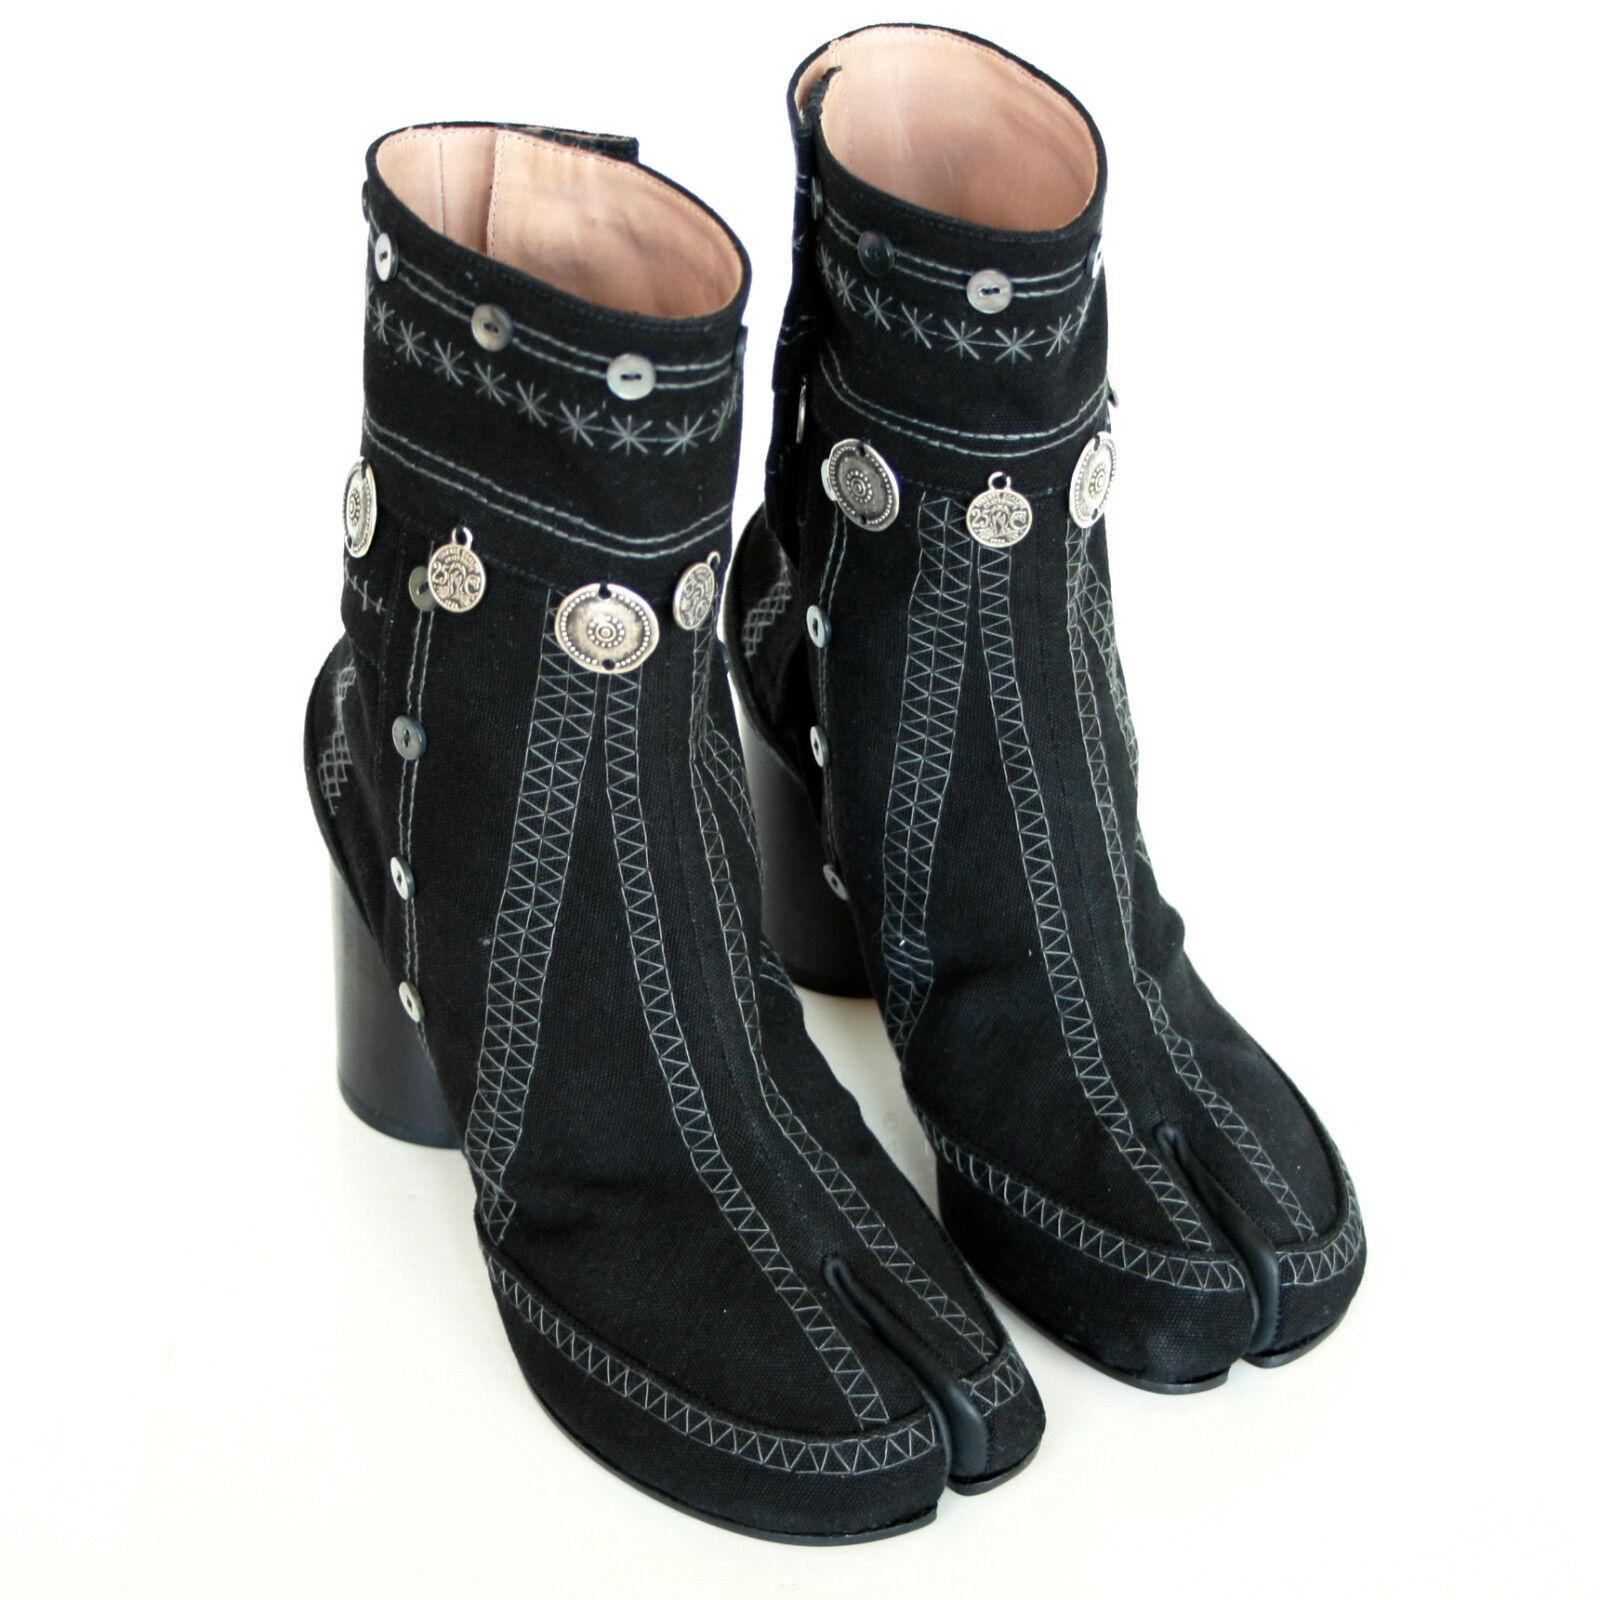 MAISON MARTIN MARGIELA split toe gypsy coin embroidered black tabi boots 35 NEW